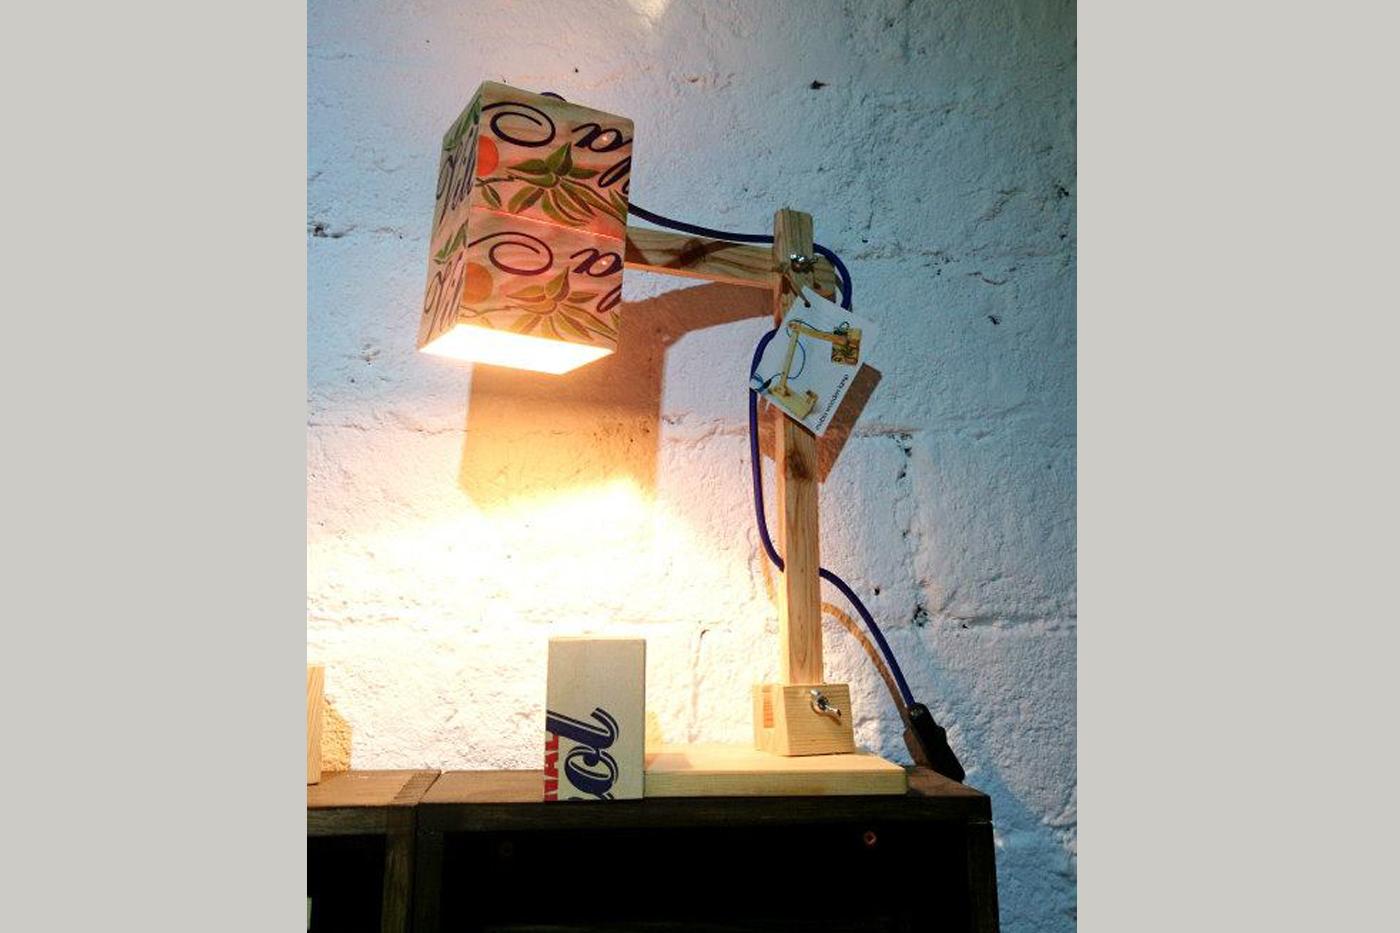 Kiruna, Gràcia, Barcelona, Mobla, lamp, lights, Lámparas, recycled, reciclado, palet, wood, madera, mobiliario